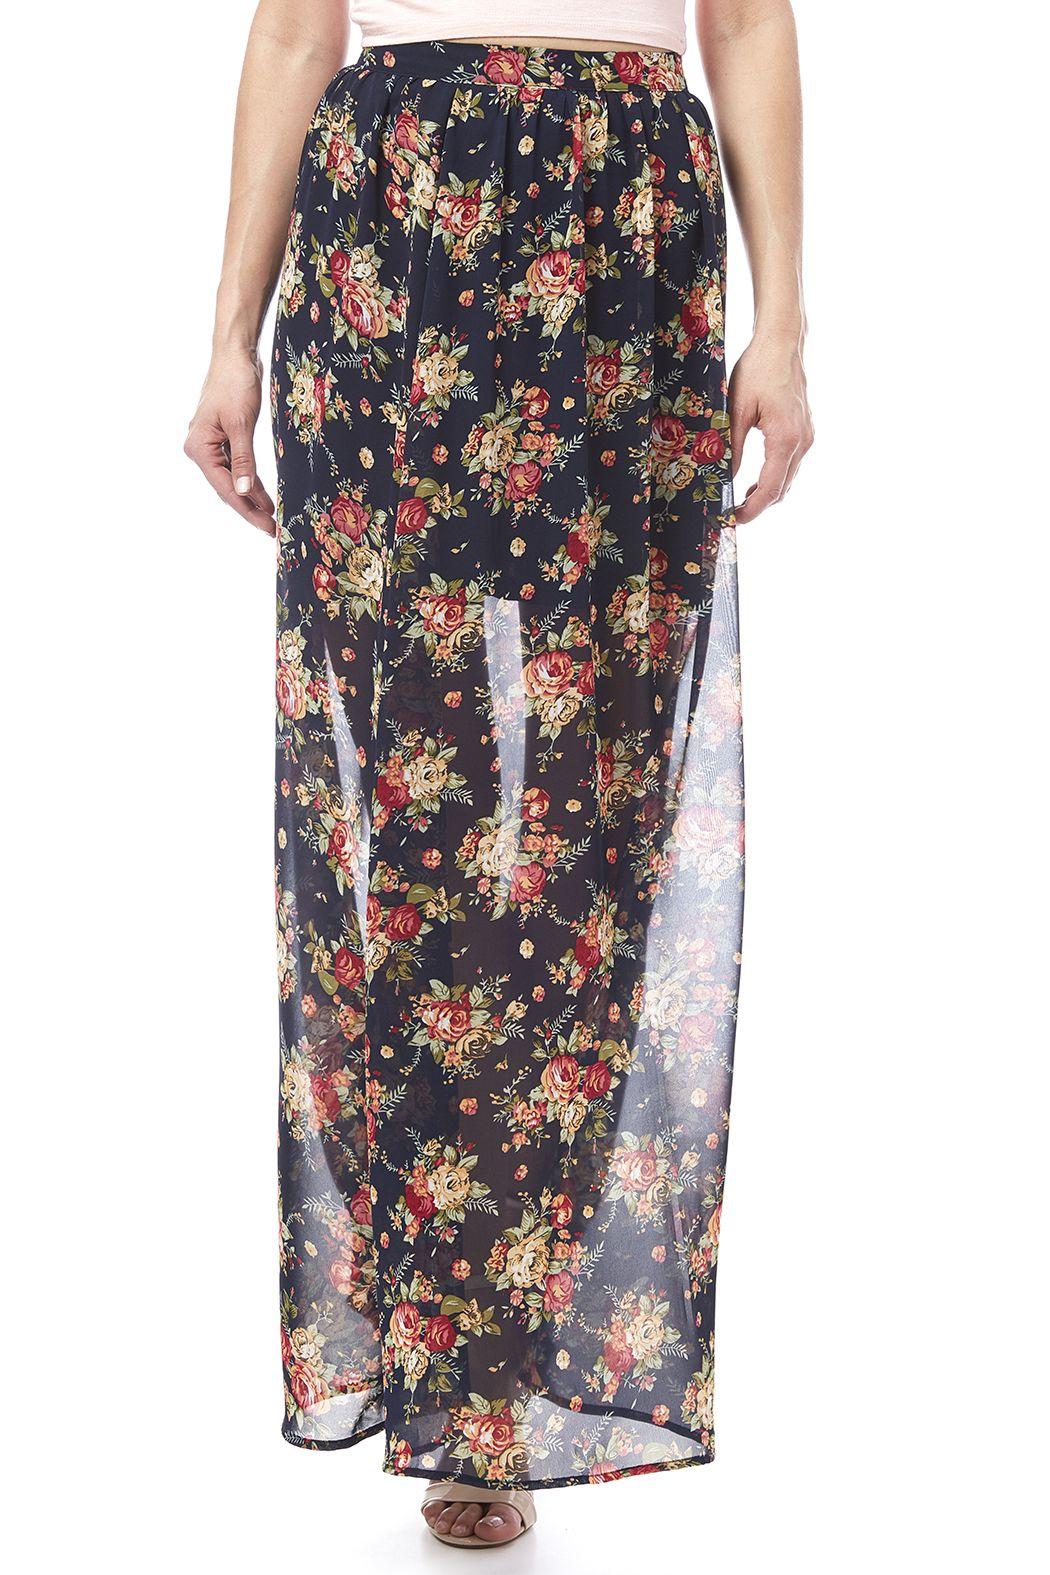 Ya Los Angeles Navy Floral Skirt | Sheer fabrics, Mini skirts and ...